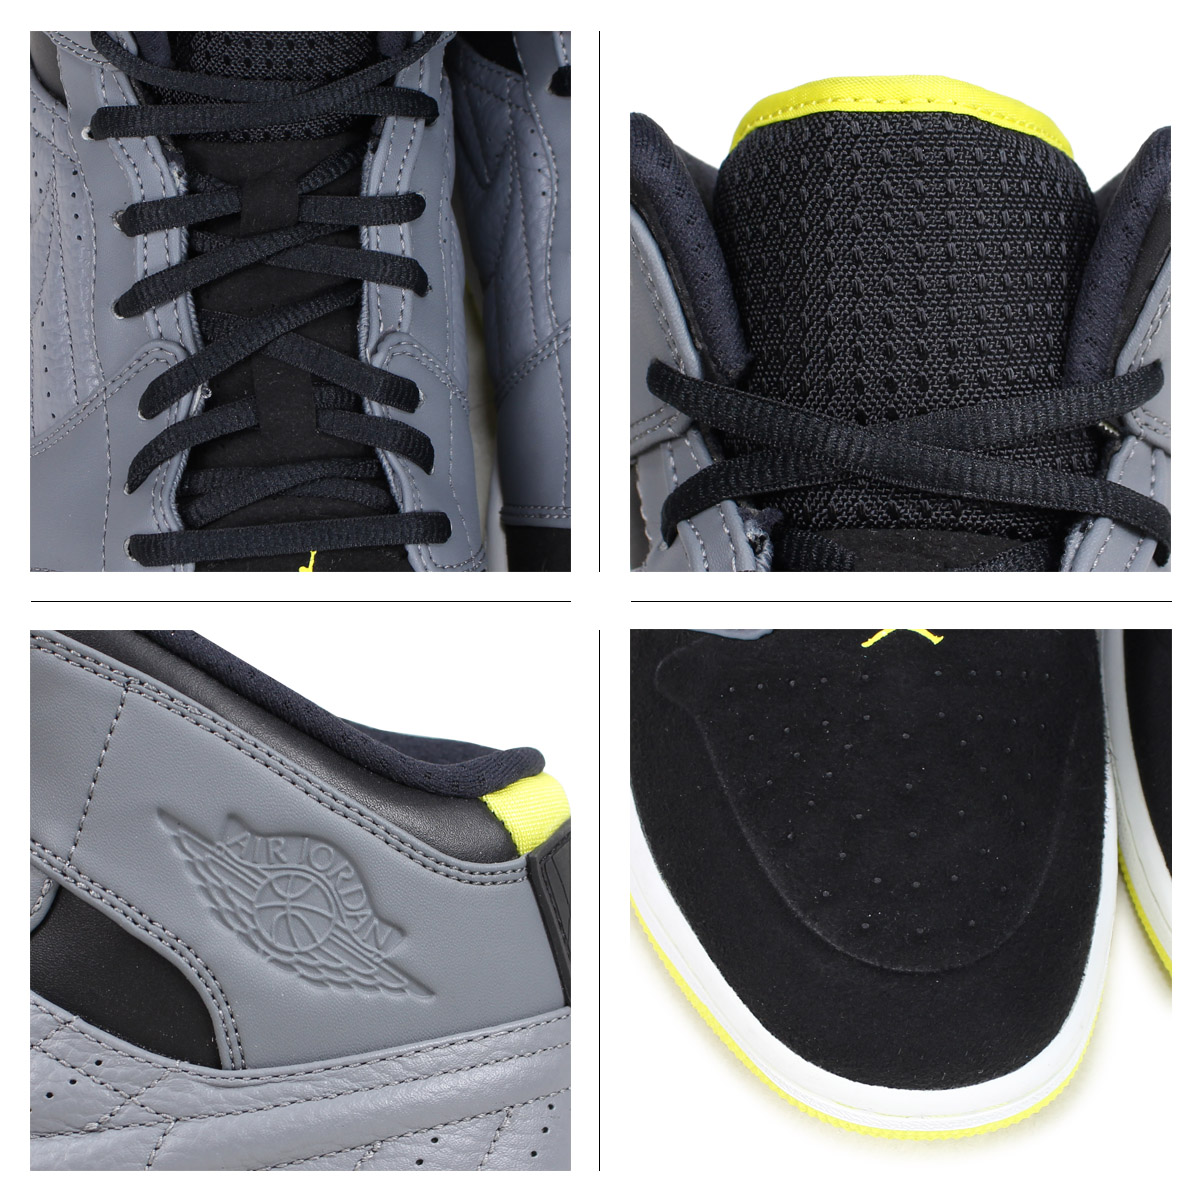 dcd44a0ae0f7 NIKE AIR JORDAN 1 RETRO 99 AJ14 Nike Air Jordan 1 nostalgic sneakers men  654